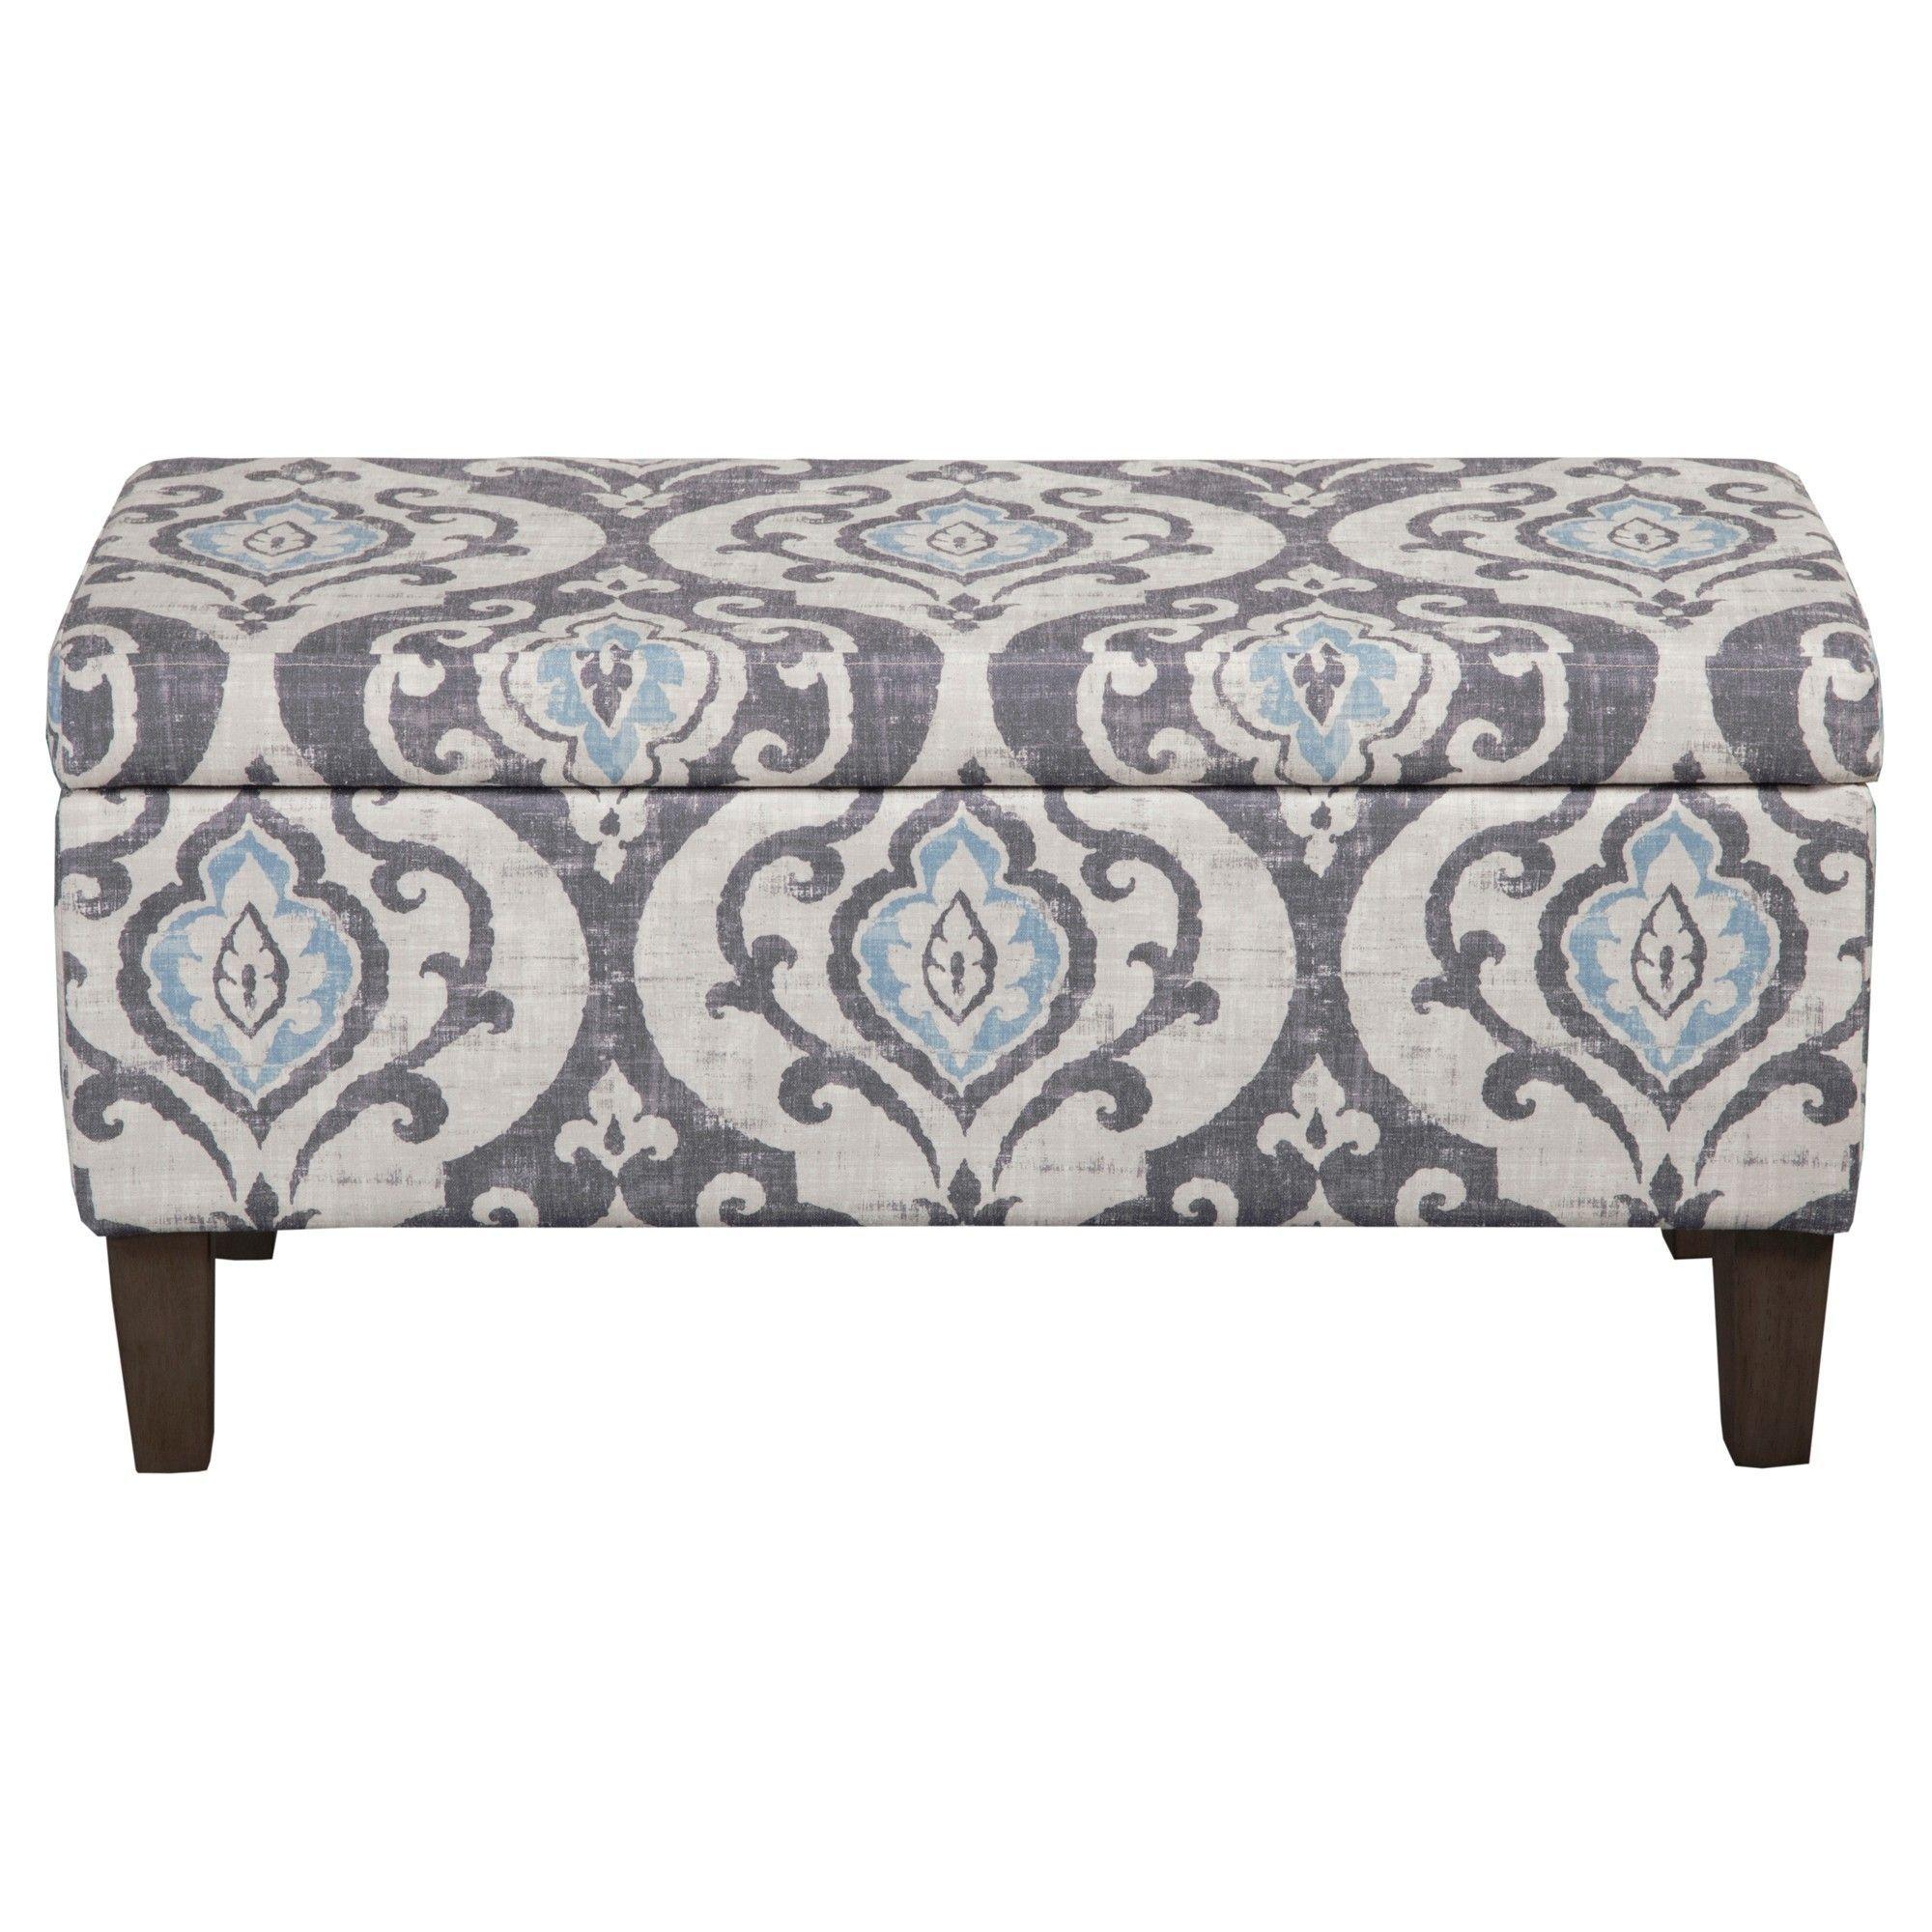 Swell Gray And Light Blue Storage Bench Large Damask Homepop Customarchery Wood Chair Design Ideas Customarcherynet